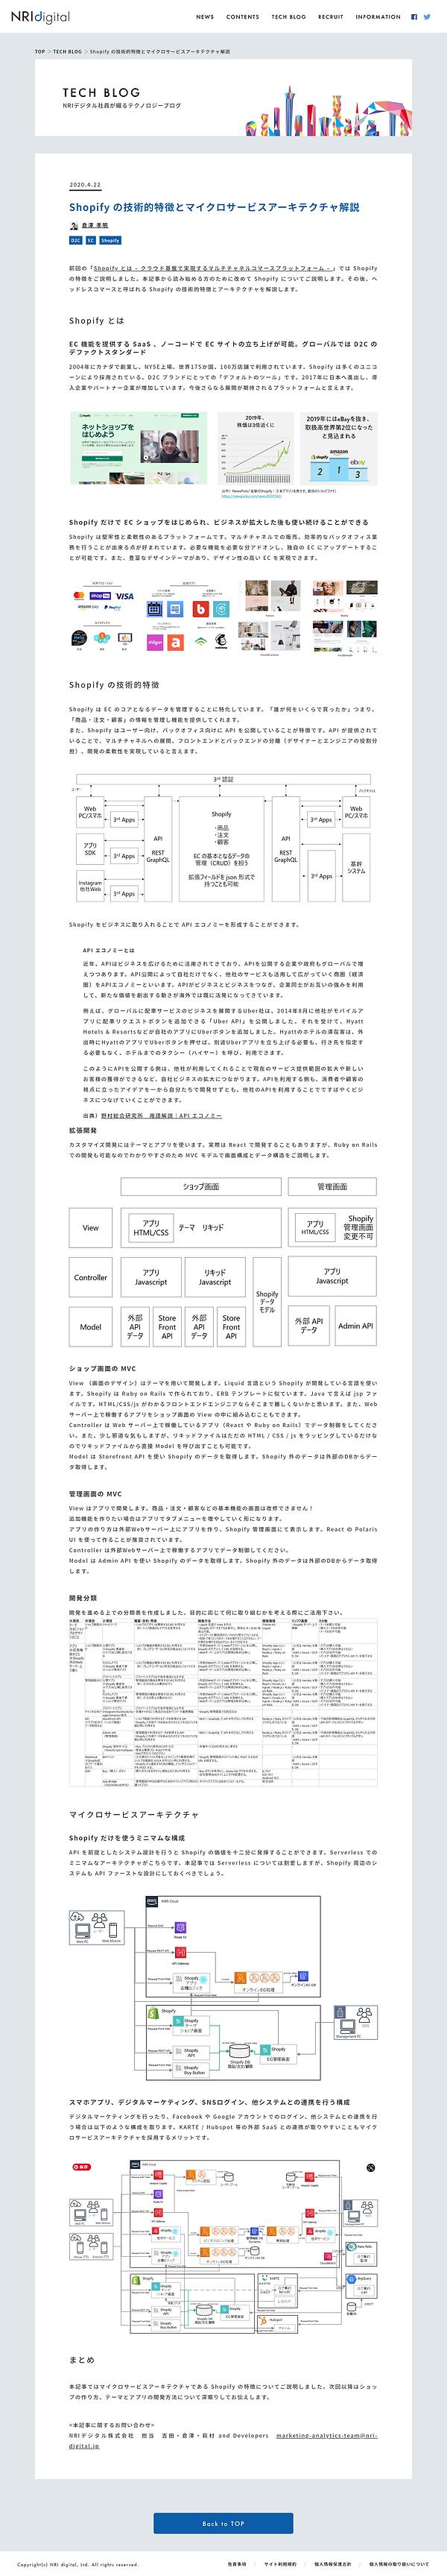 Screenshot - 2021-01-17T234804.671.png